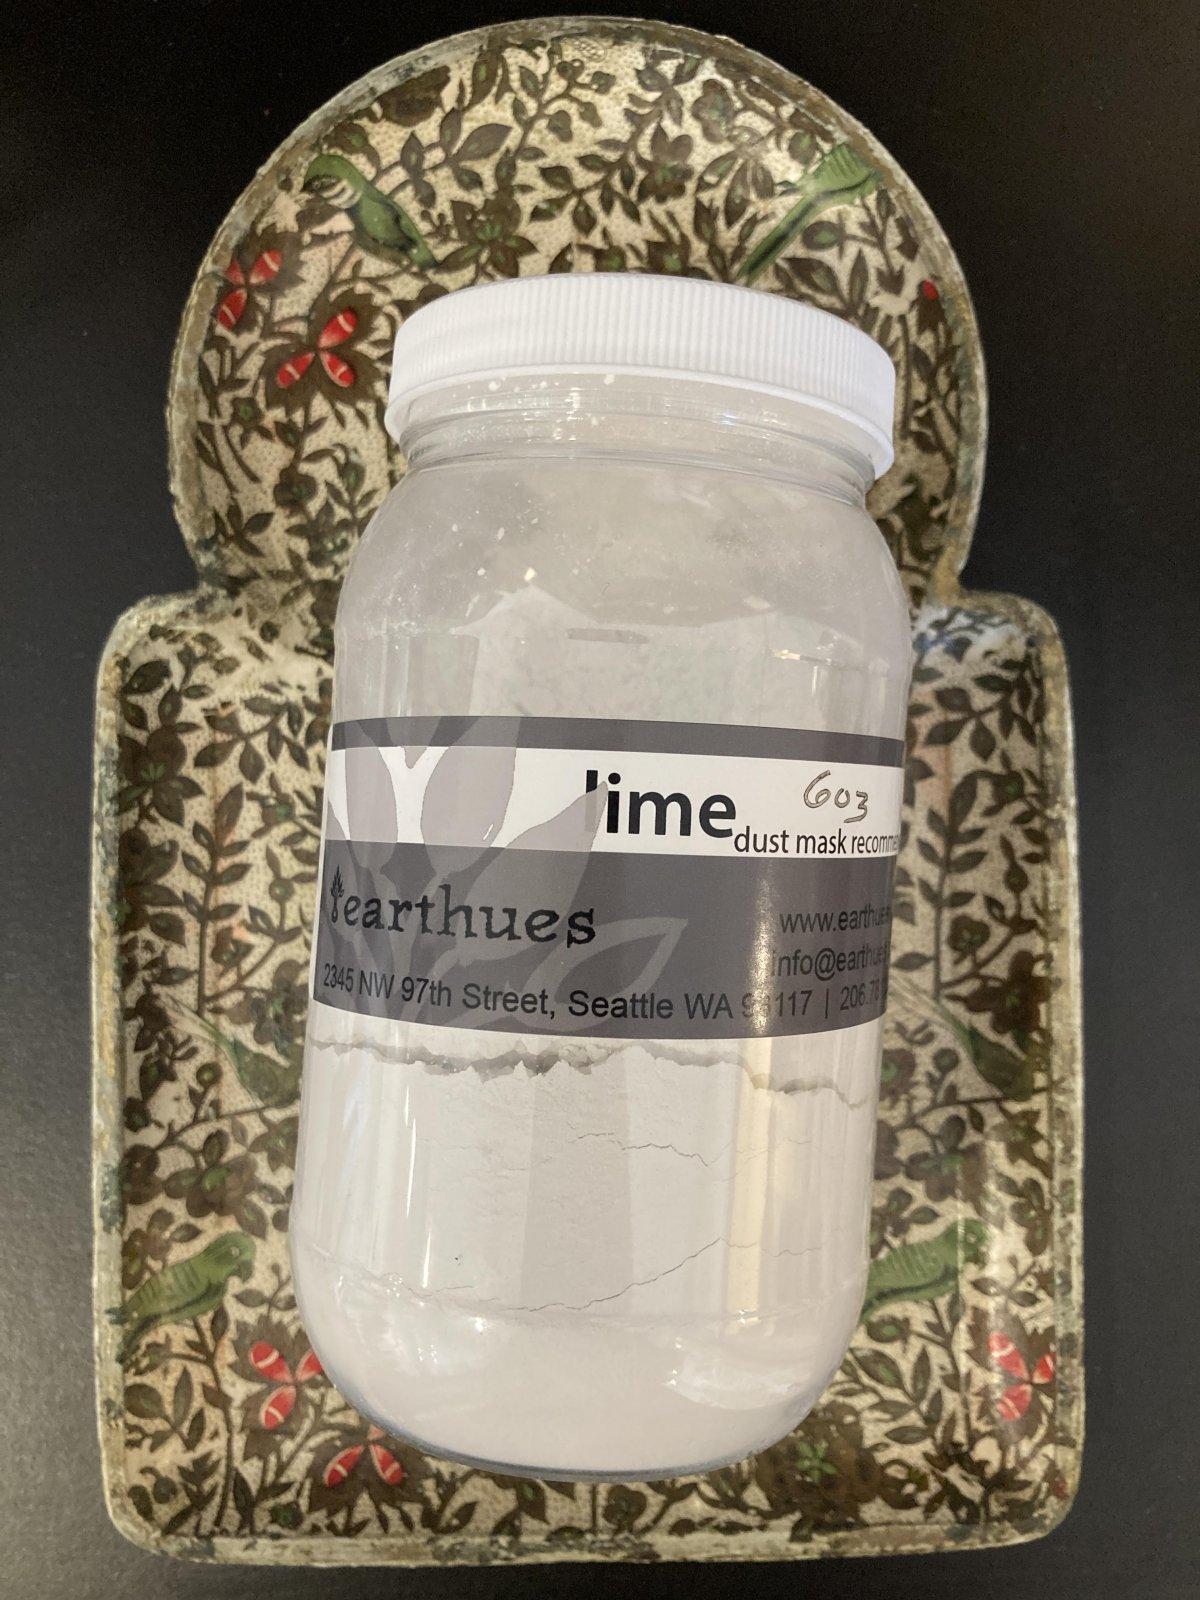 Calcium Hydroxide -Lime 6oz